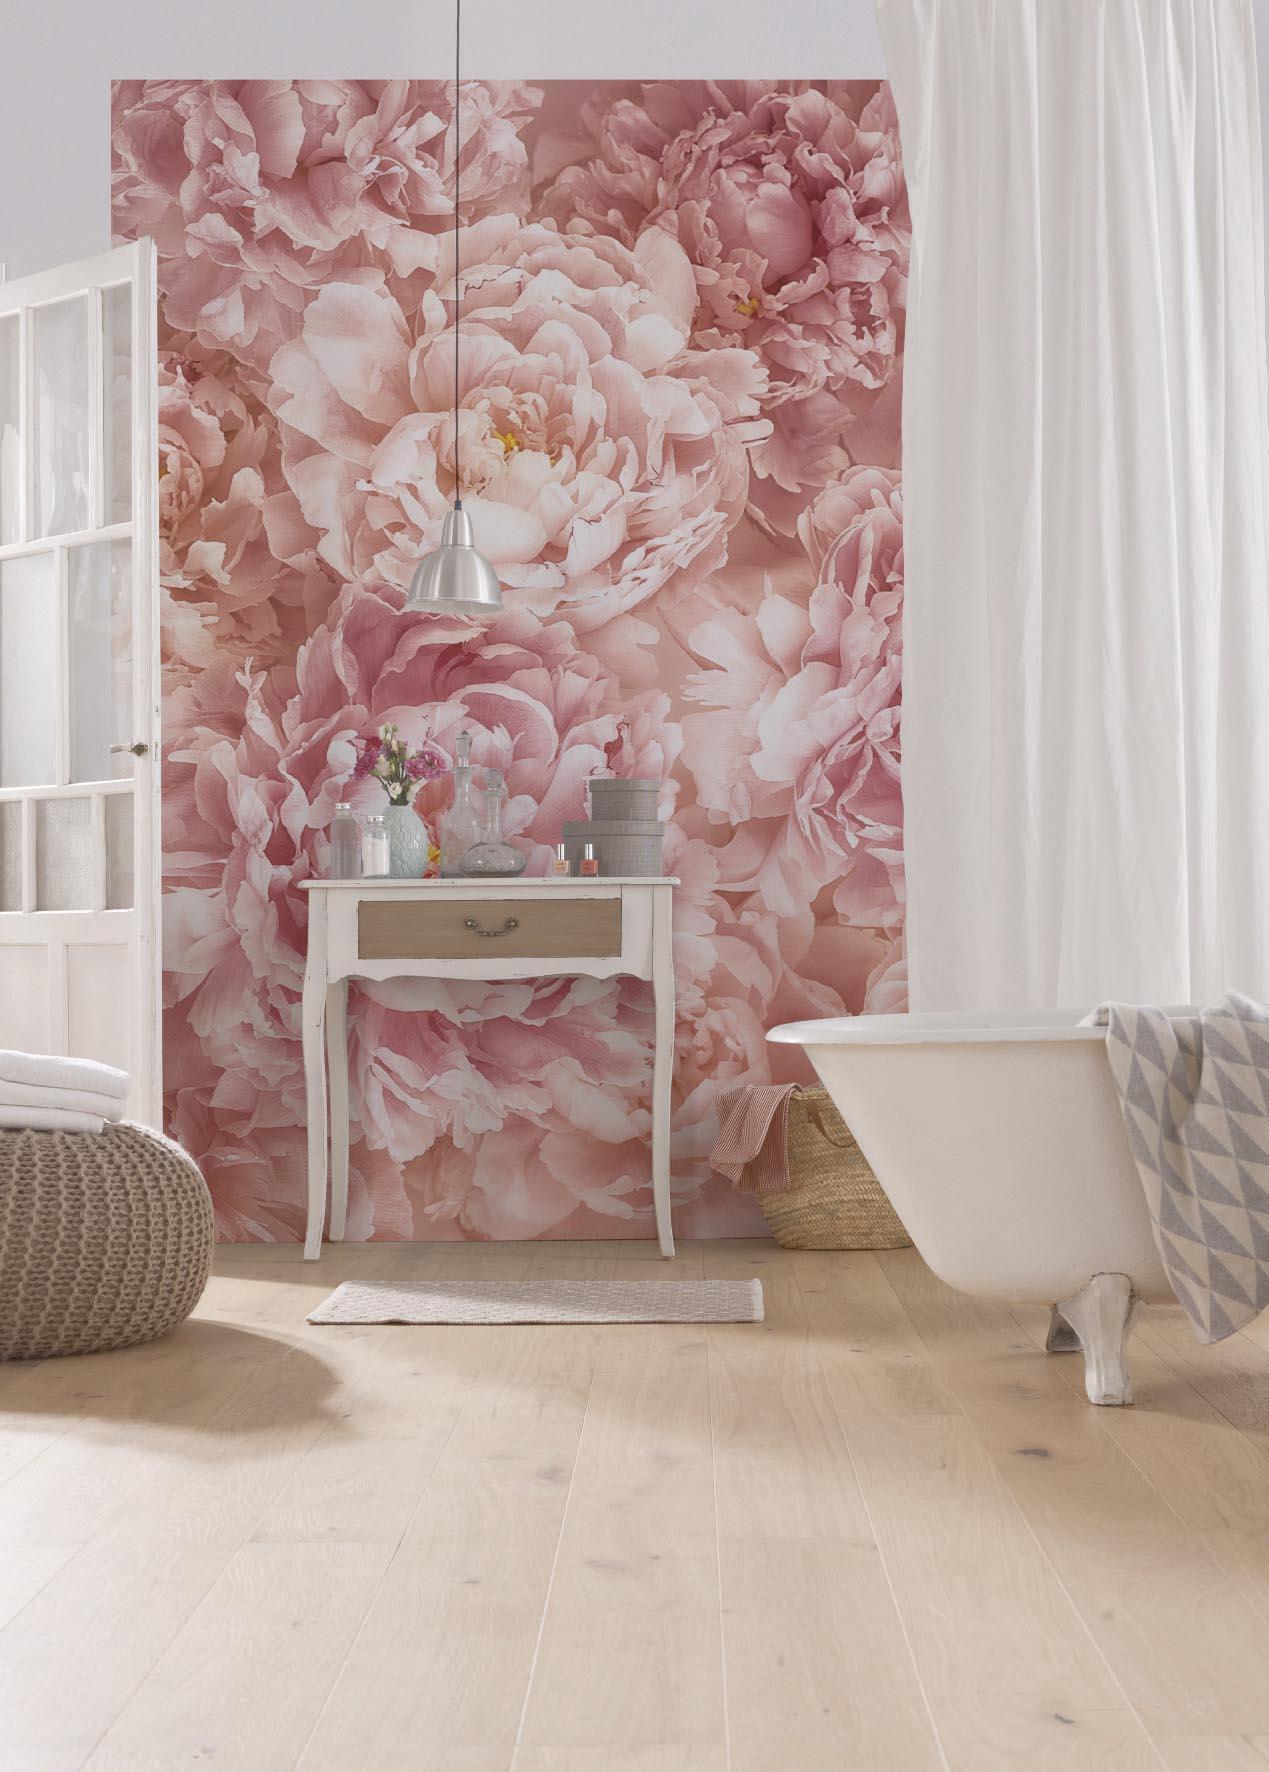 vliestapete fototapete soave 184x248 rosa blumen nelken. Black Bedroom Furniture Sets. Home Design Ideas